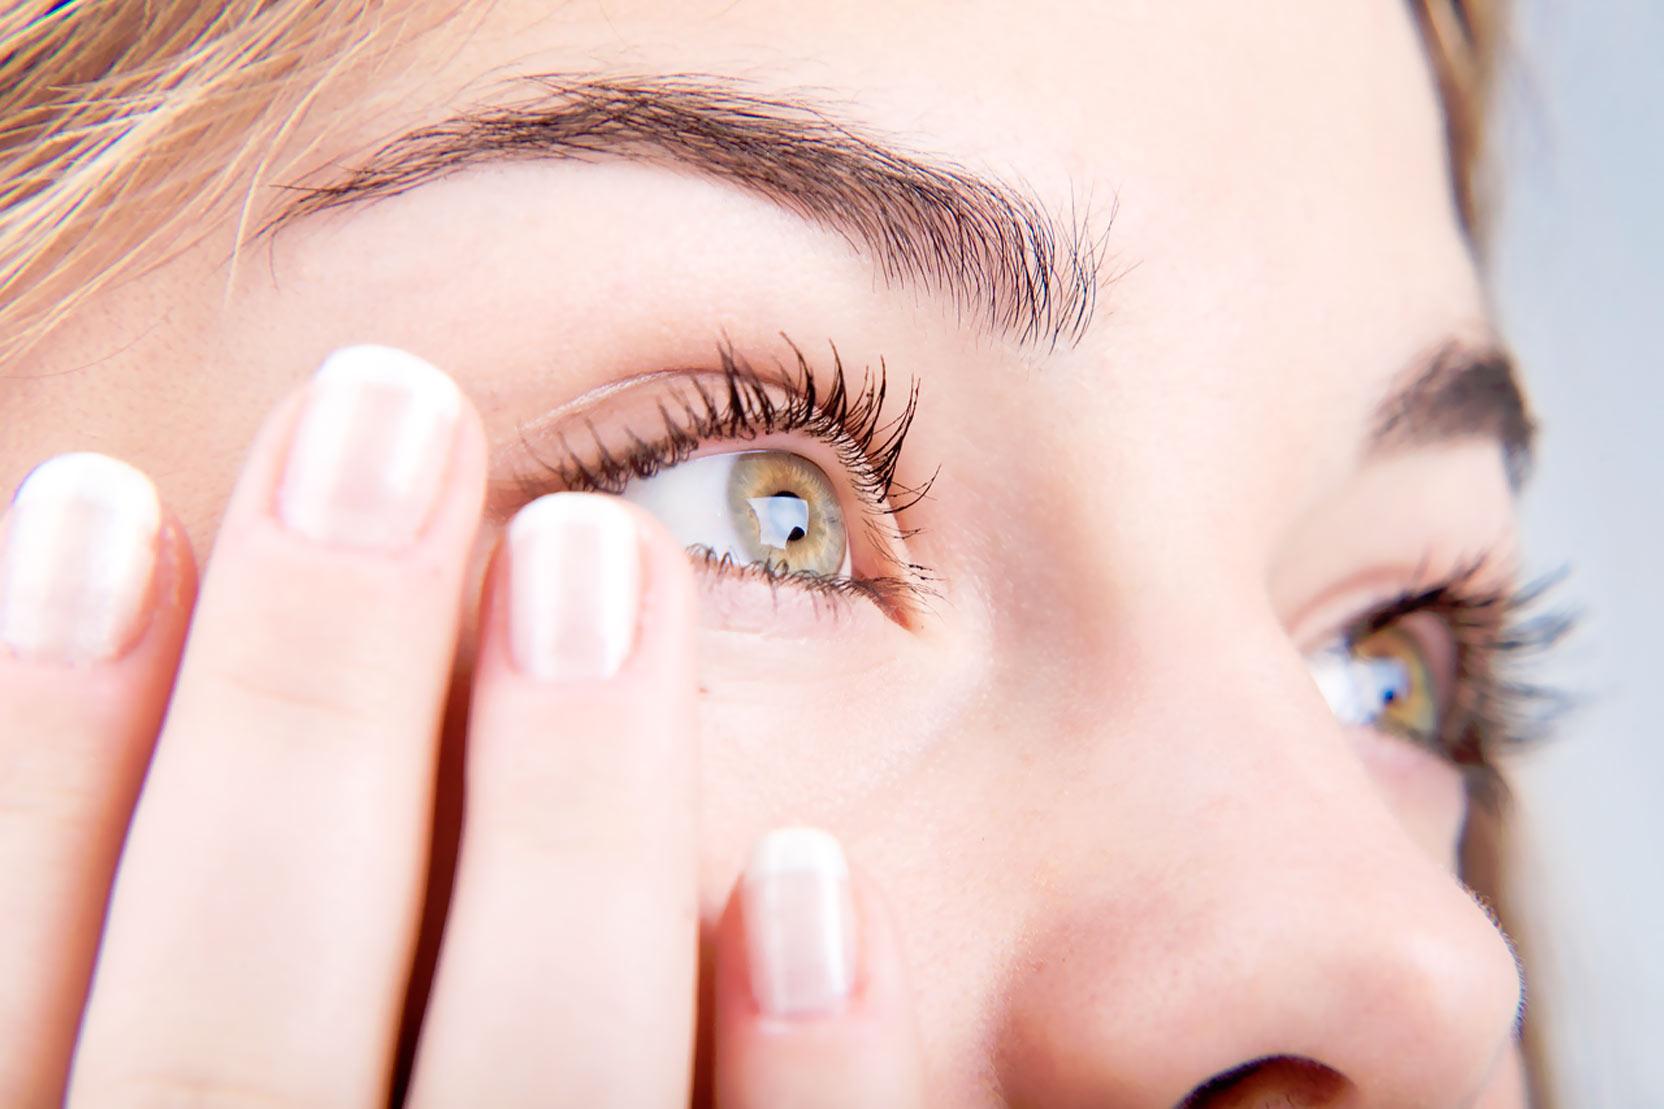 Как убрать желтизну глаз желтый налет на глазном яблоке